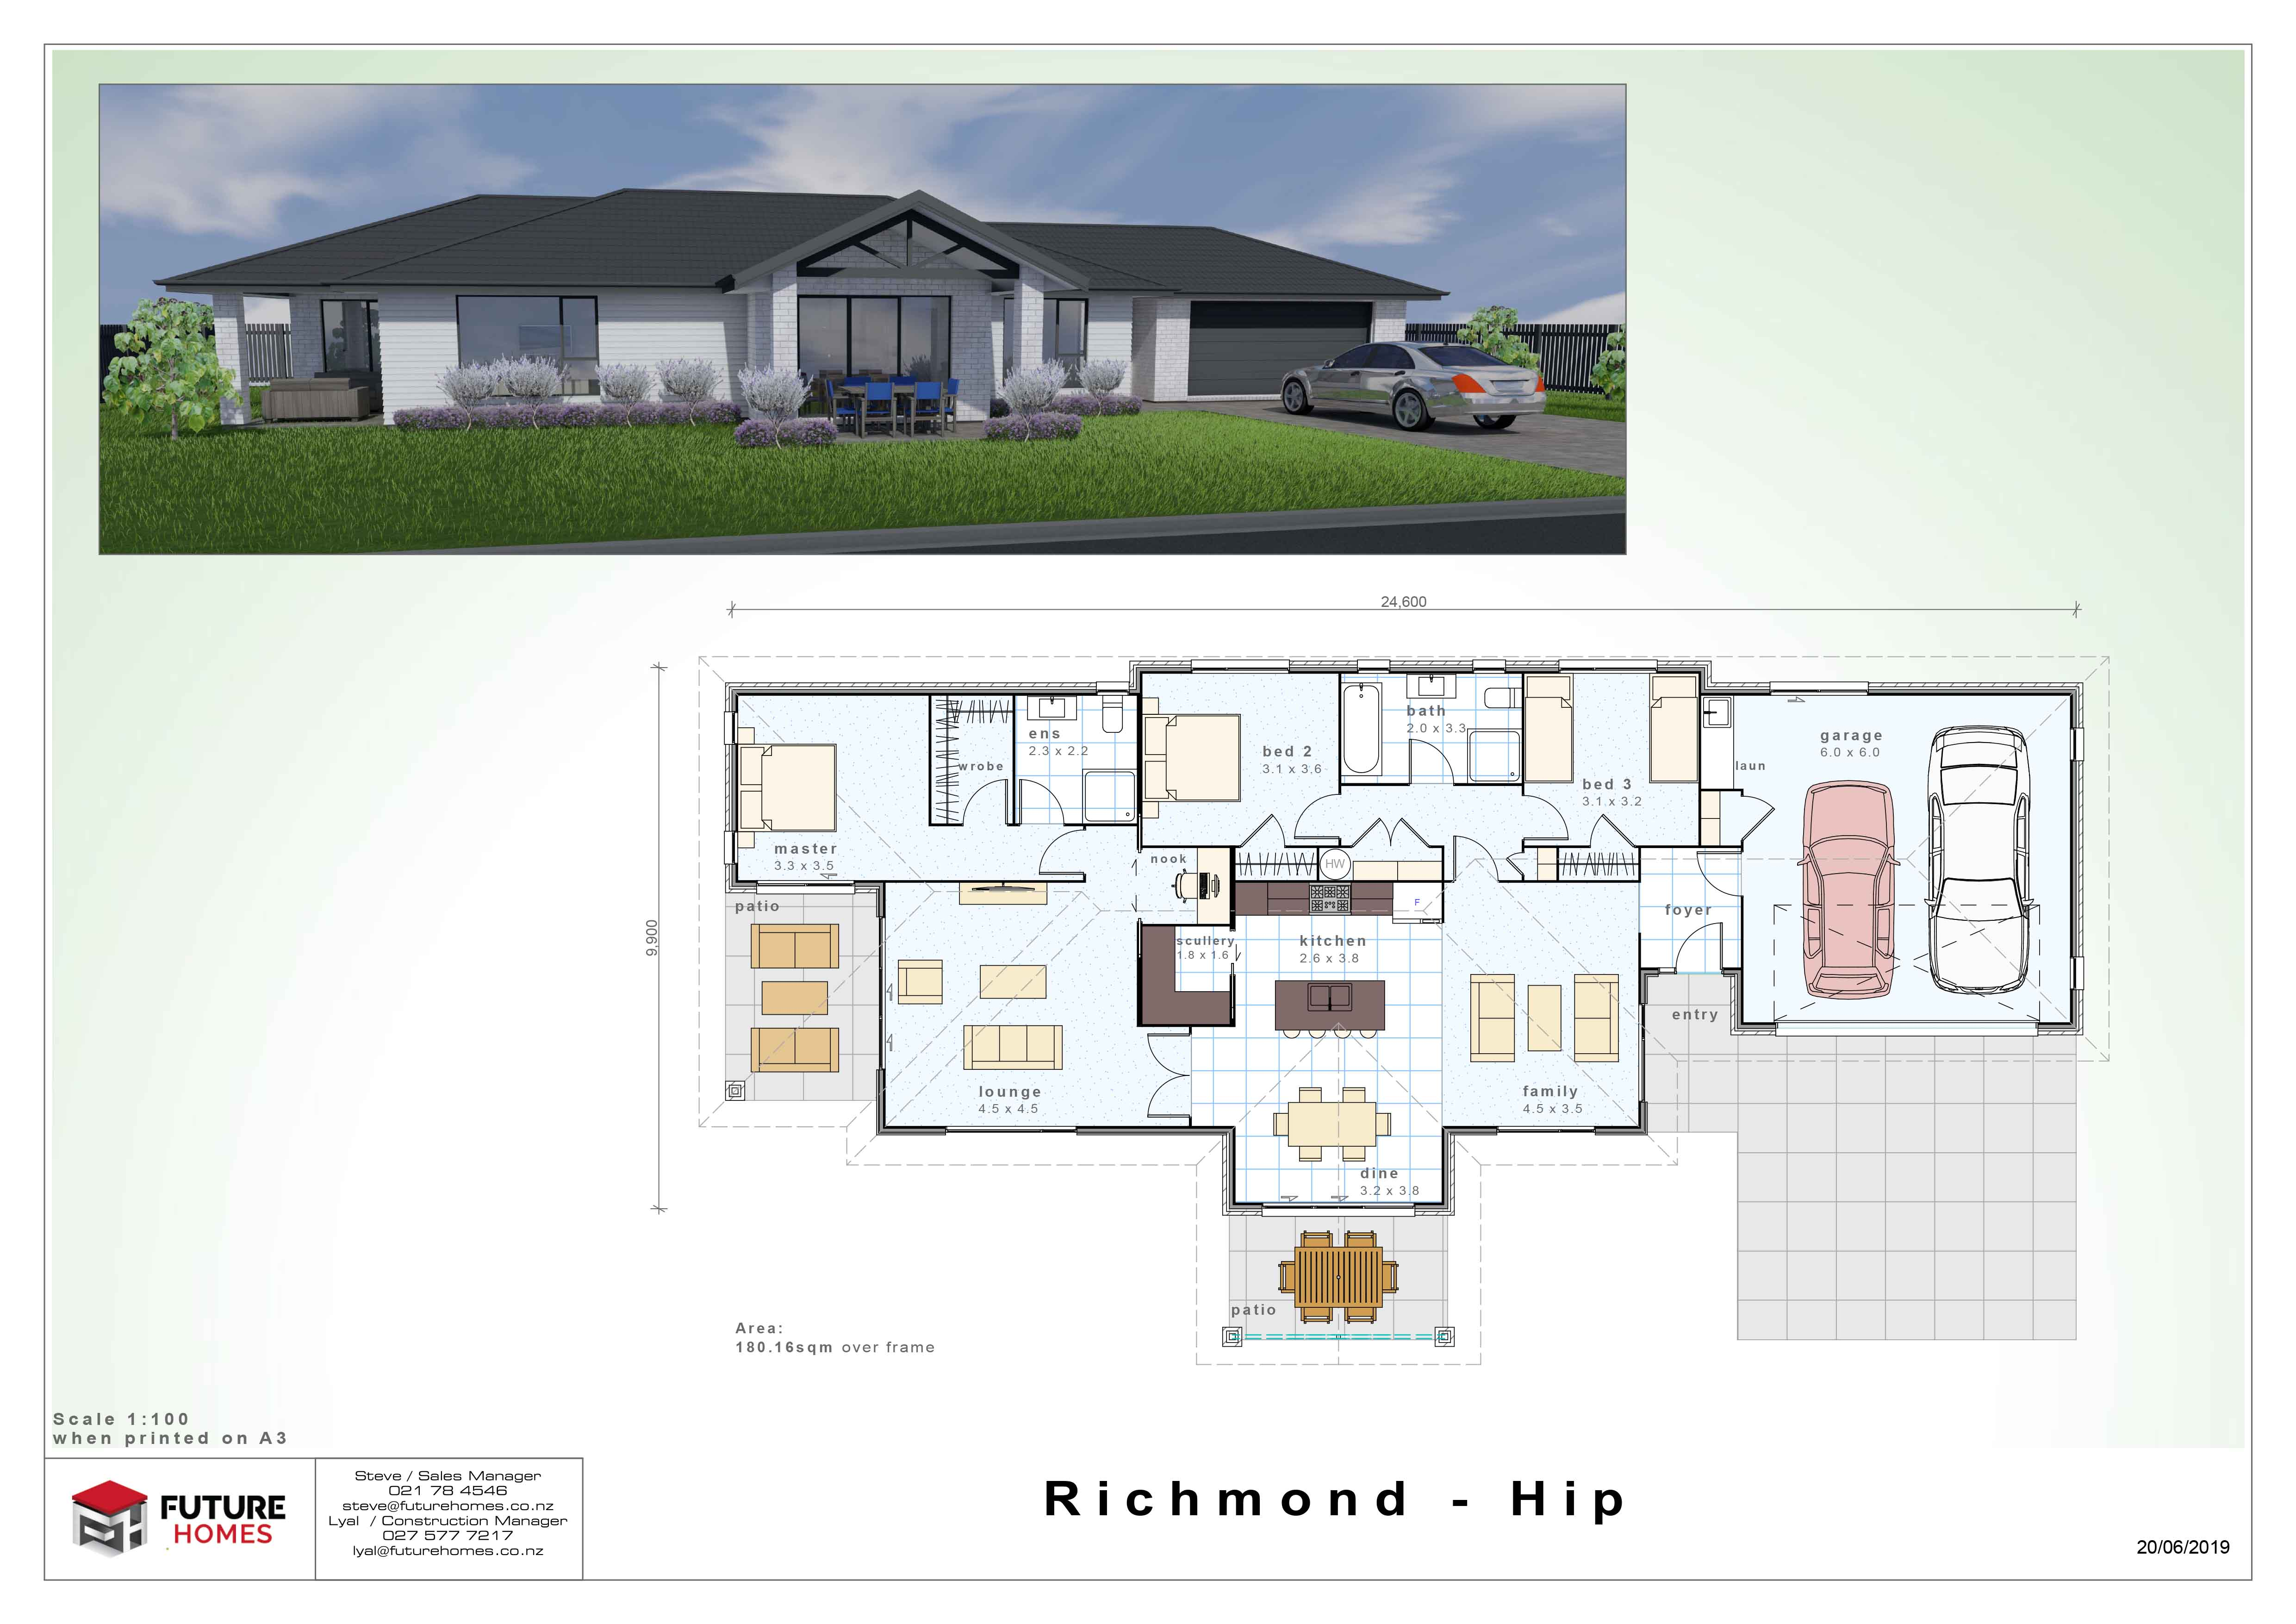 Richmond – Hip